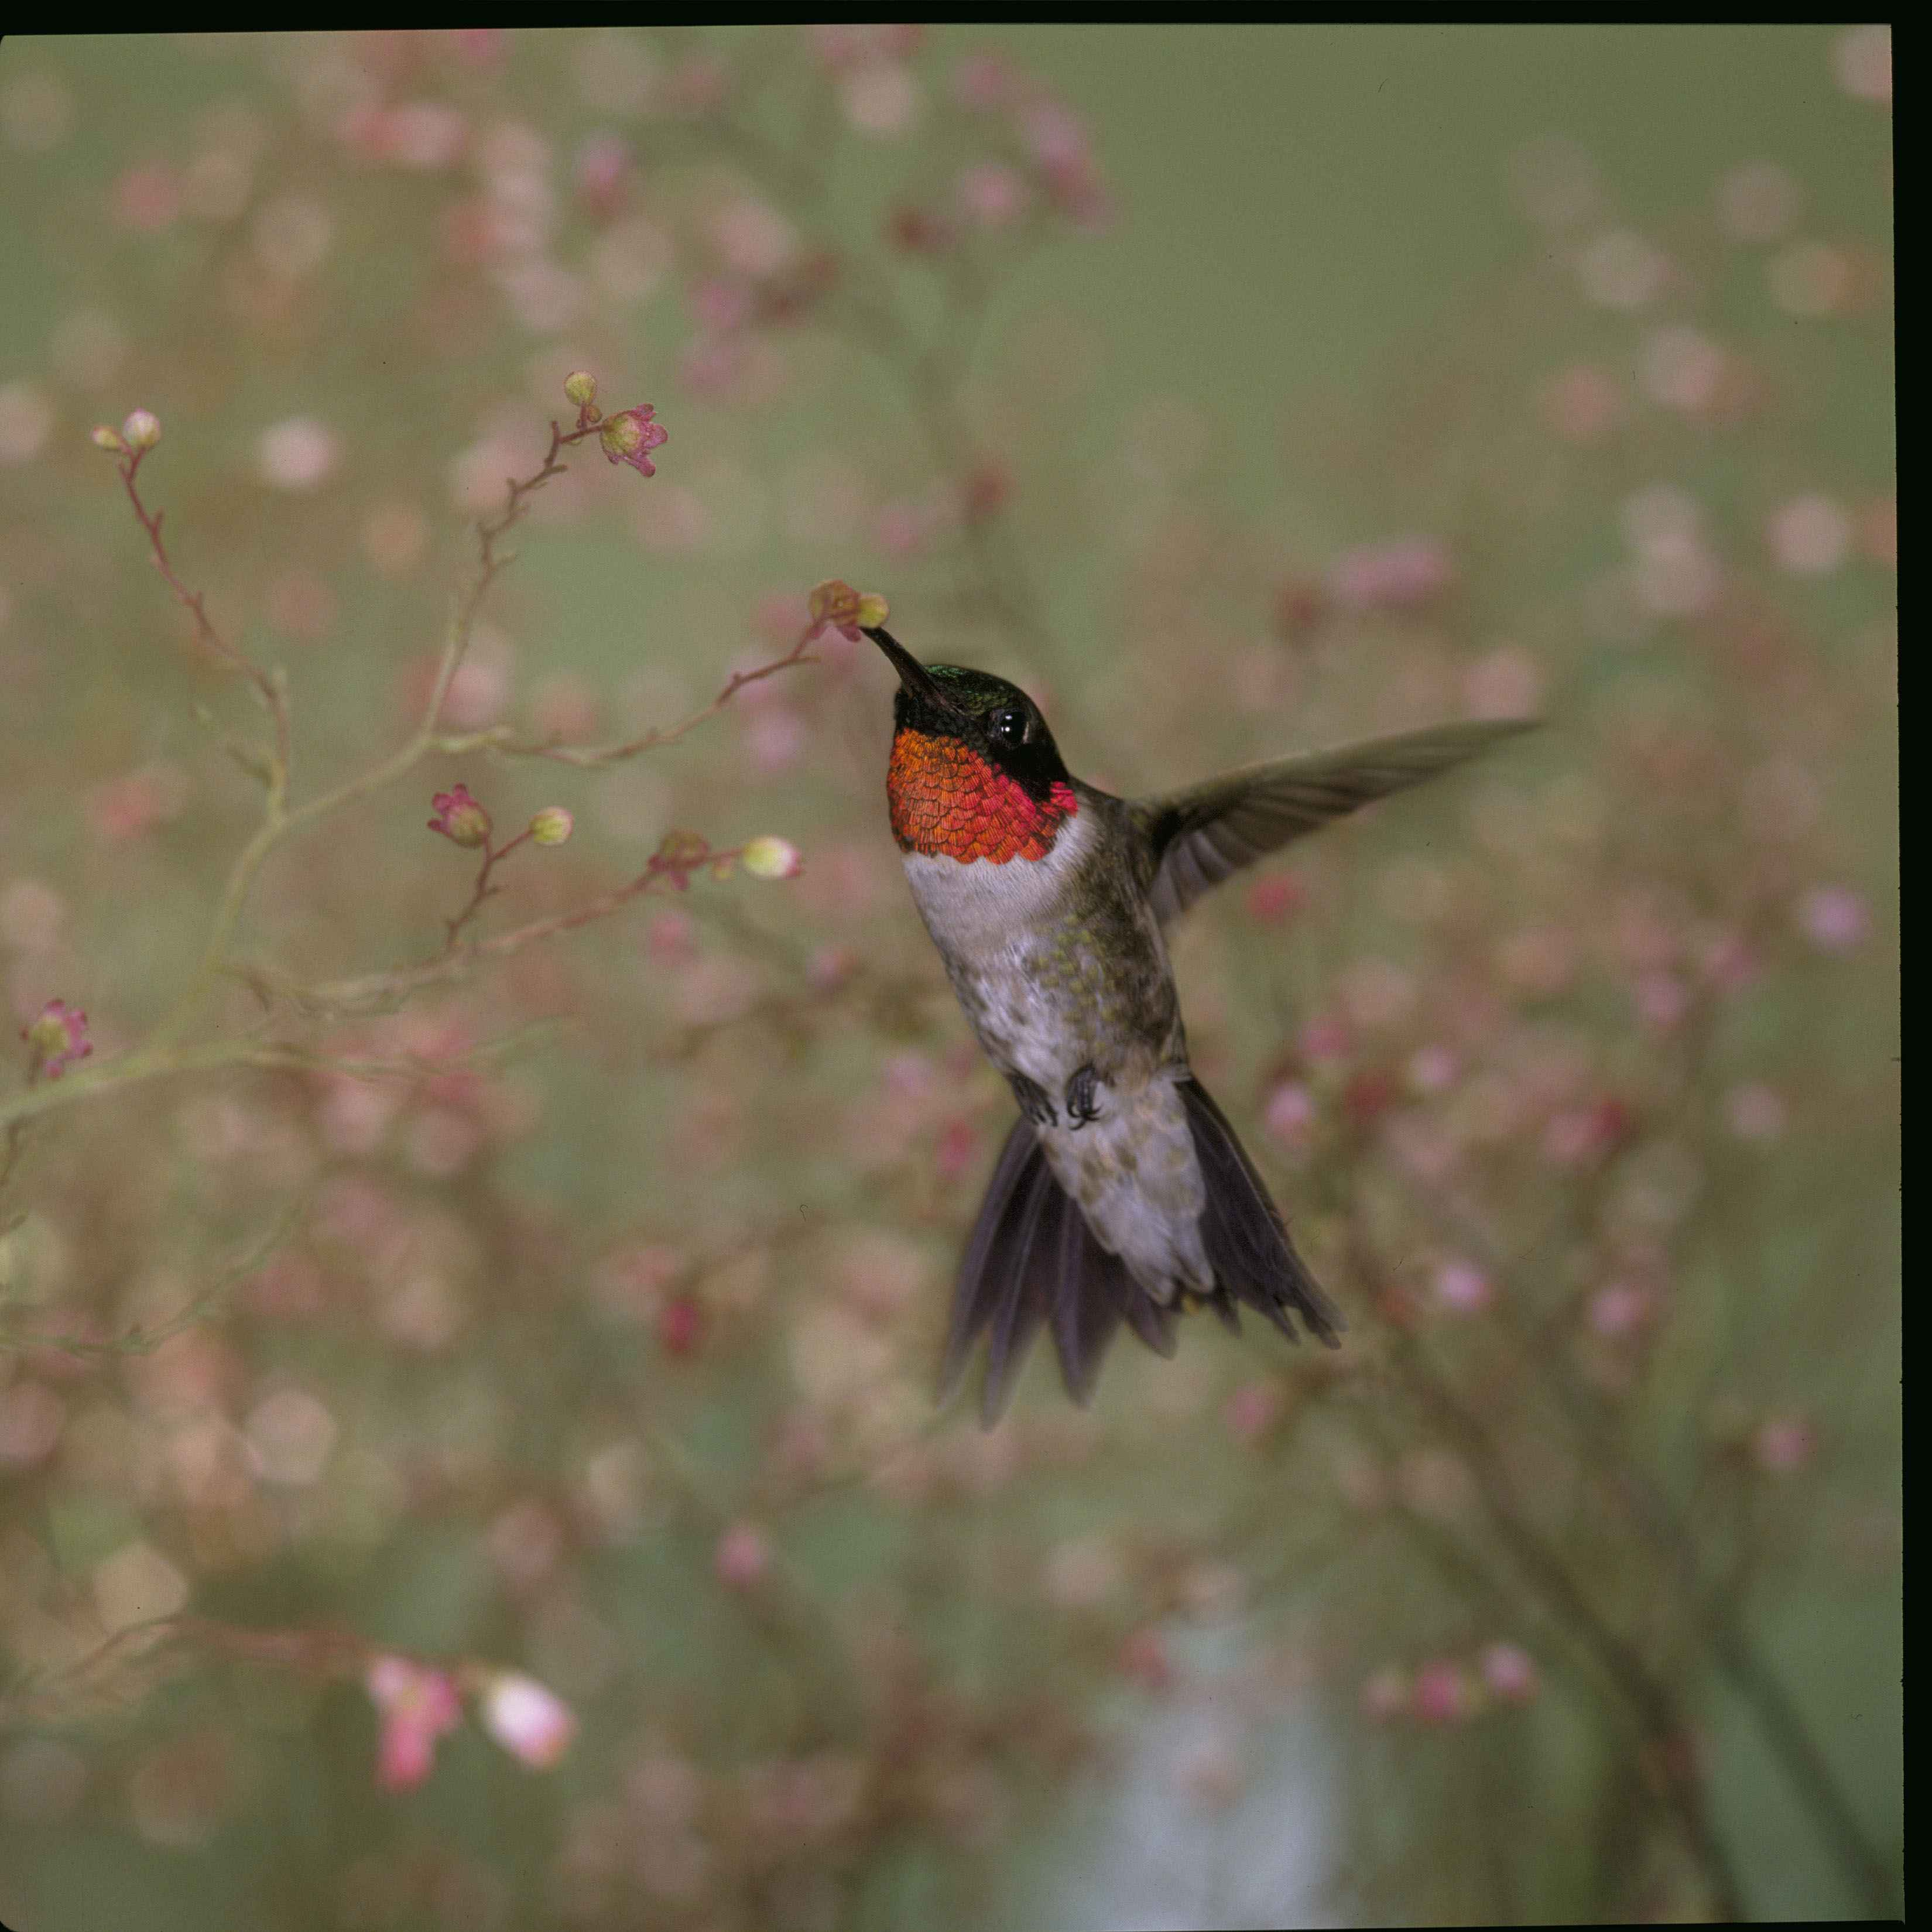 hummingbirds free images public domain images